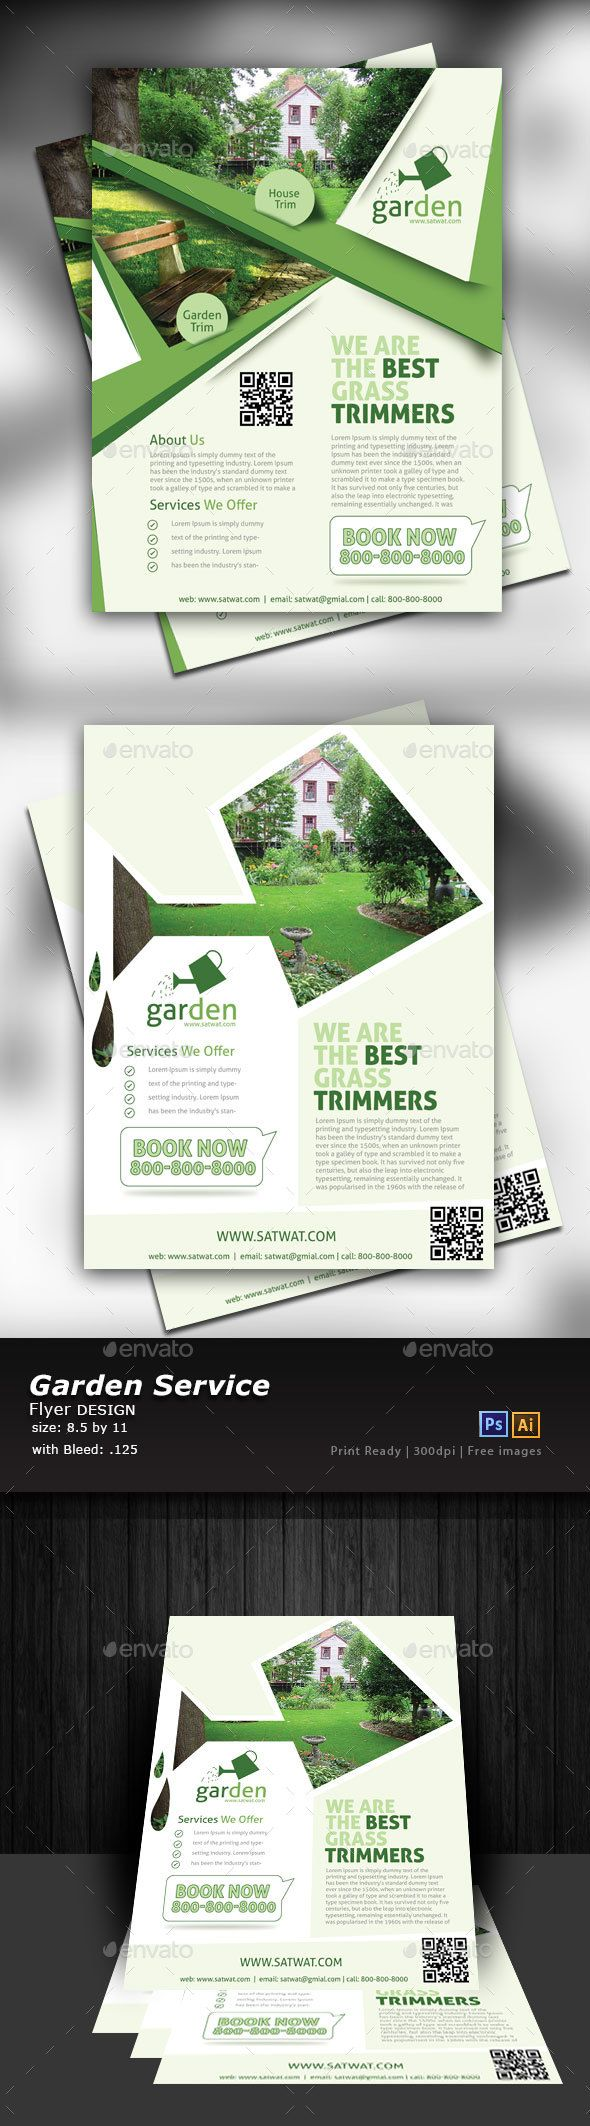 Lawn Care Flyer Templates PSD, Vector EPS, AI Illustrator | Flyer ...